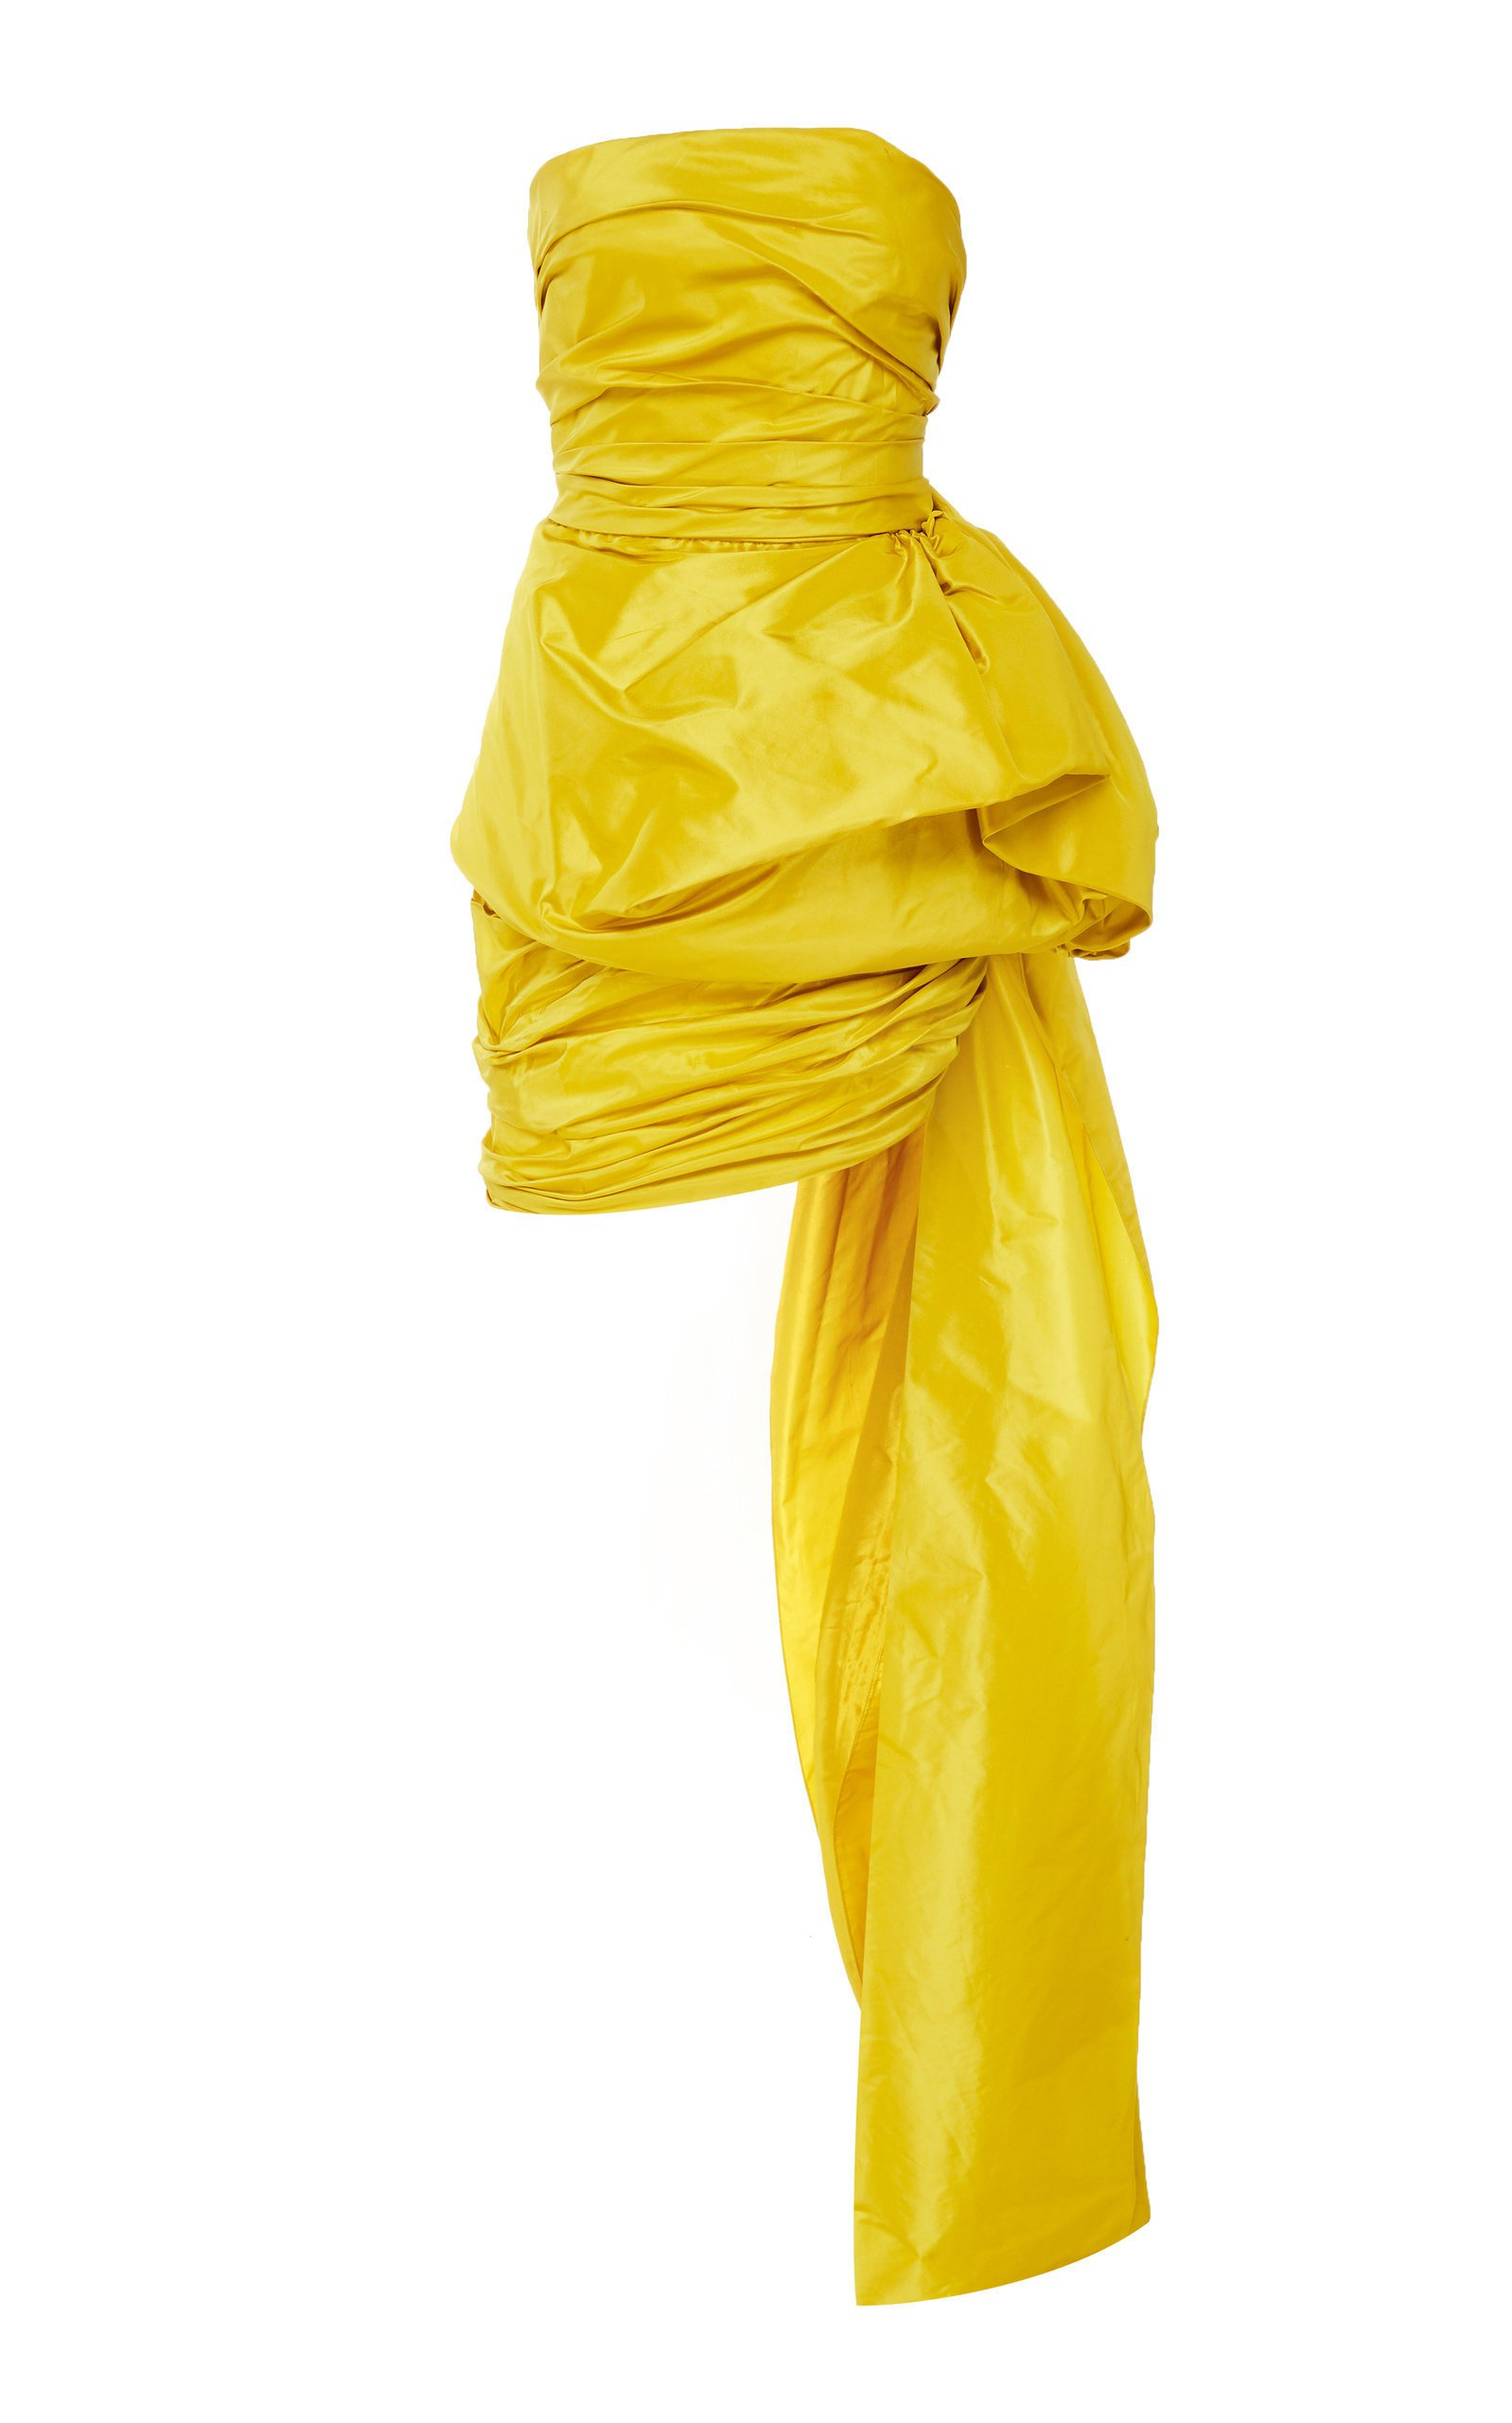 large_oscar-de-la-renta-yellow-strapless-ruched-silk-mini-dress-with-train.jpg (1598×2560)